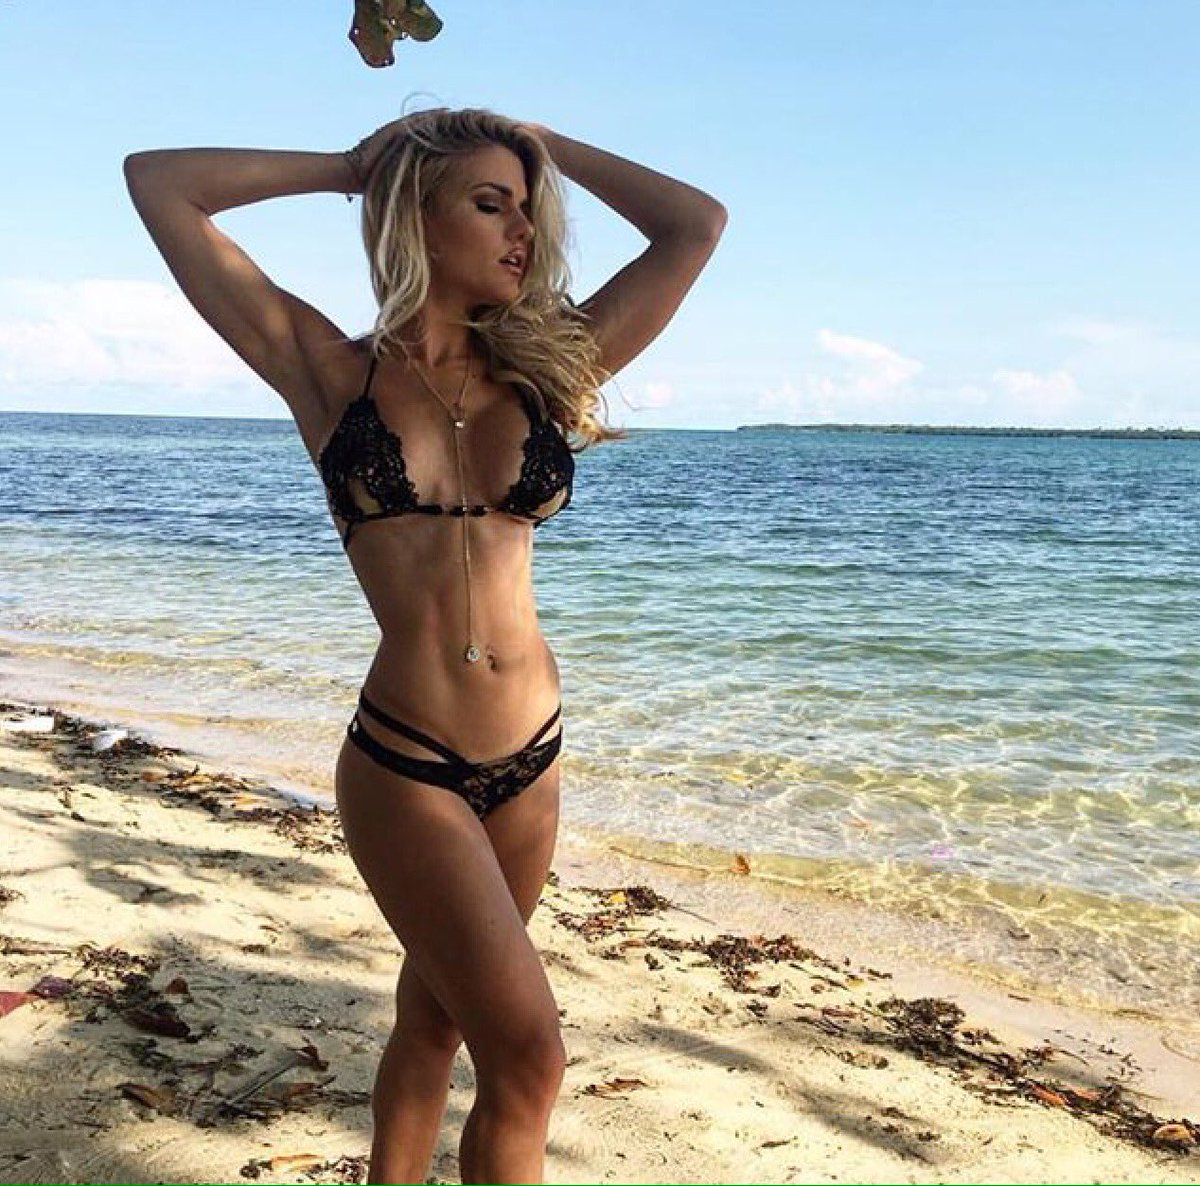 2019 Marissa Everhart naked (48 photos), Sexy, Sideboobs, Boobs, swimsuit 2006